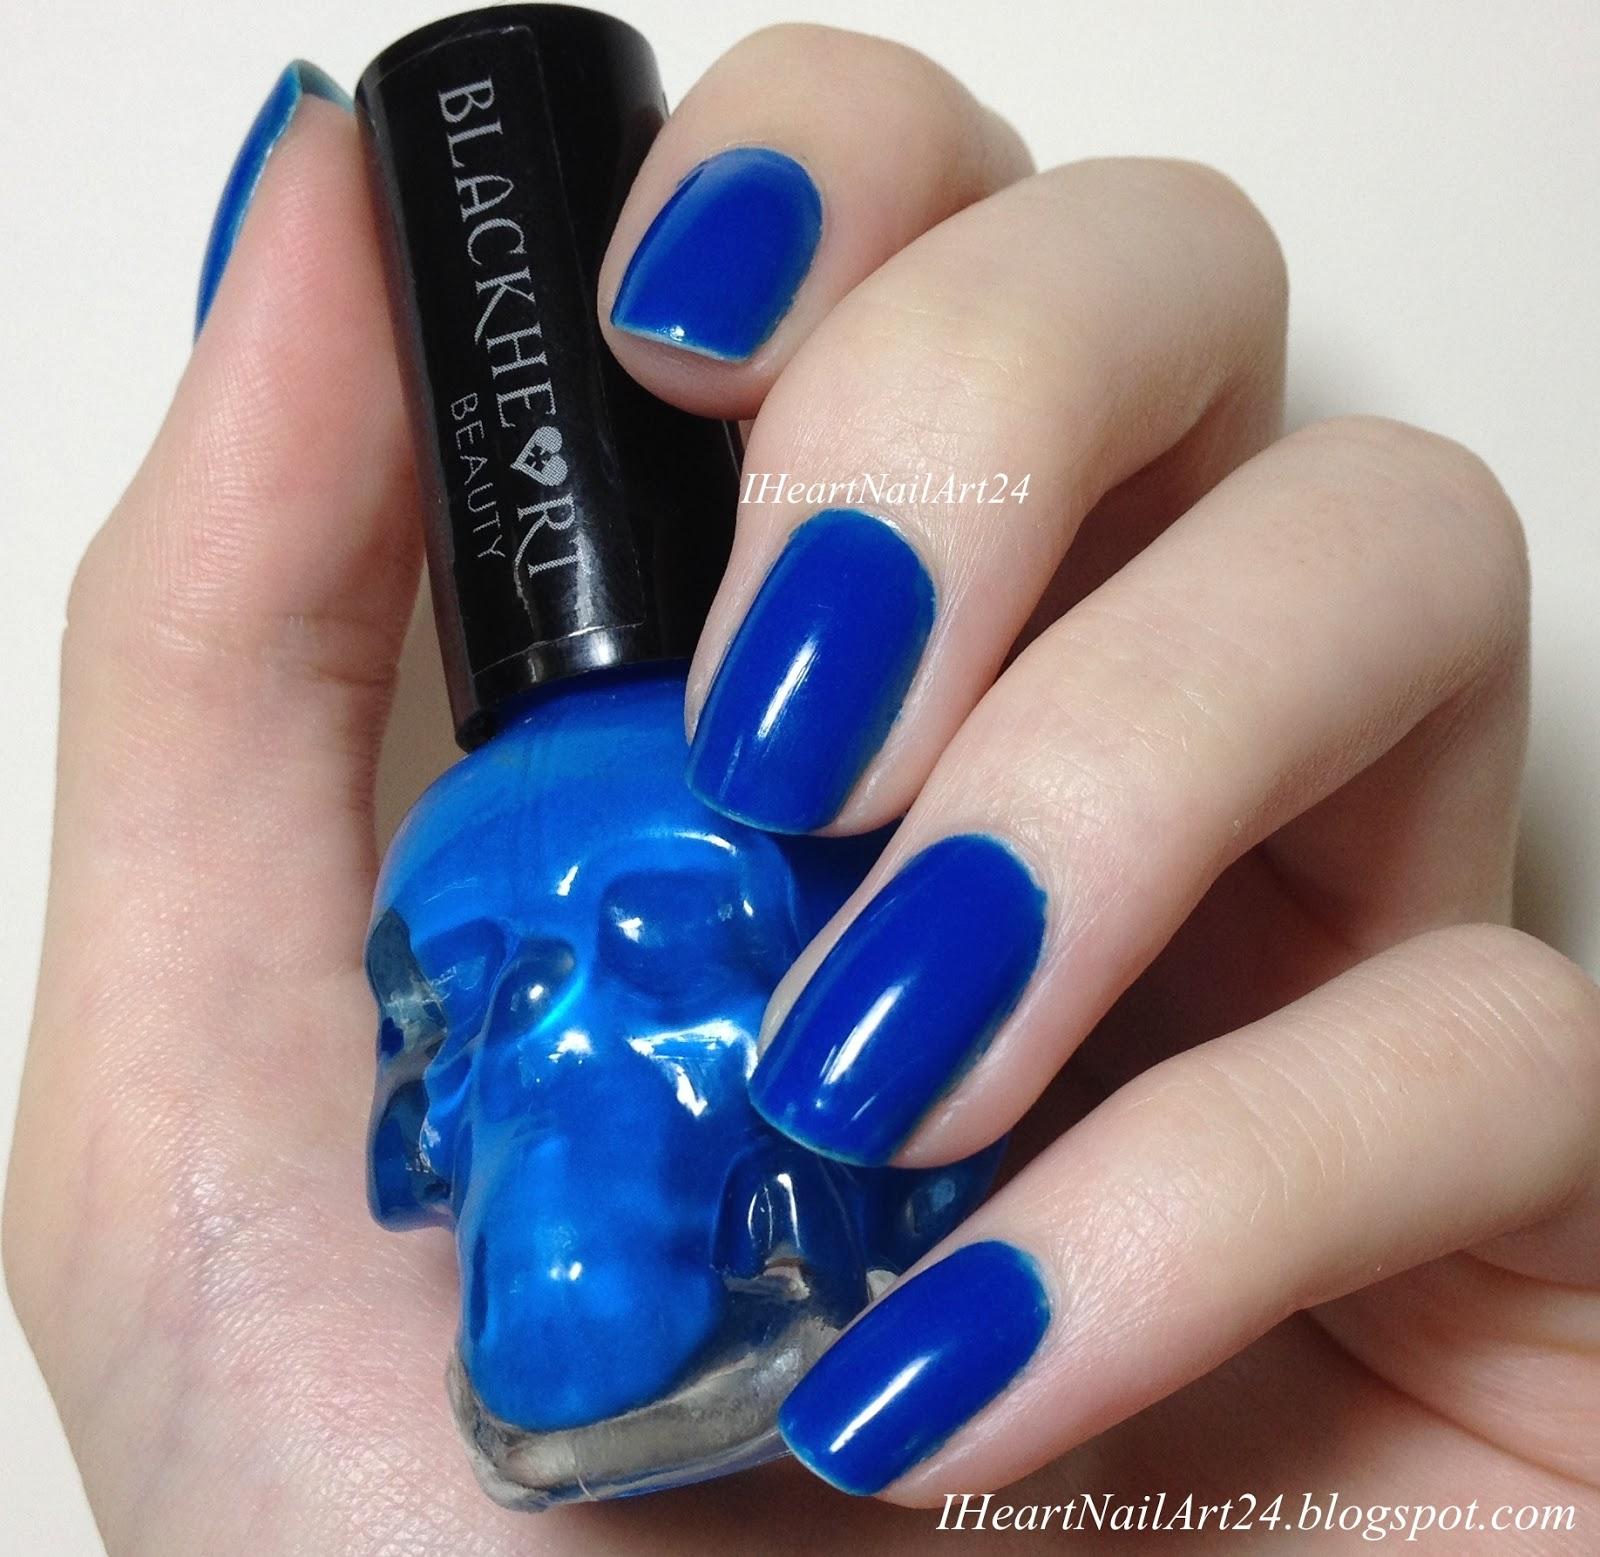 Black Heart Beauty Nail Polishes Swatches & Review | I Heart Nail Art